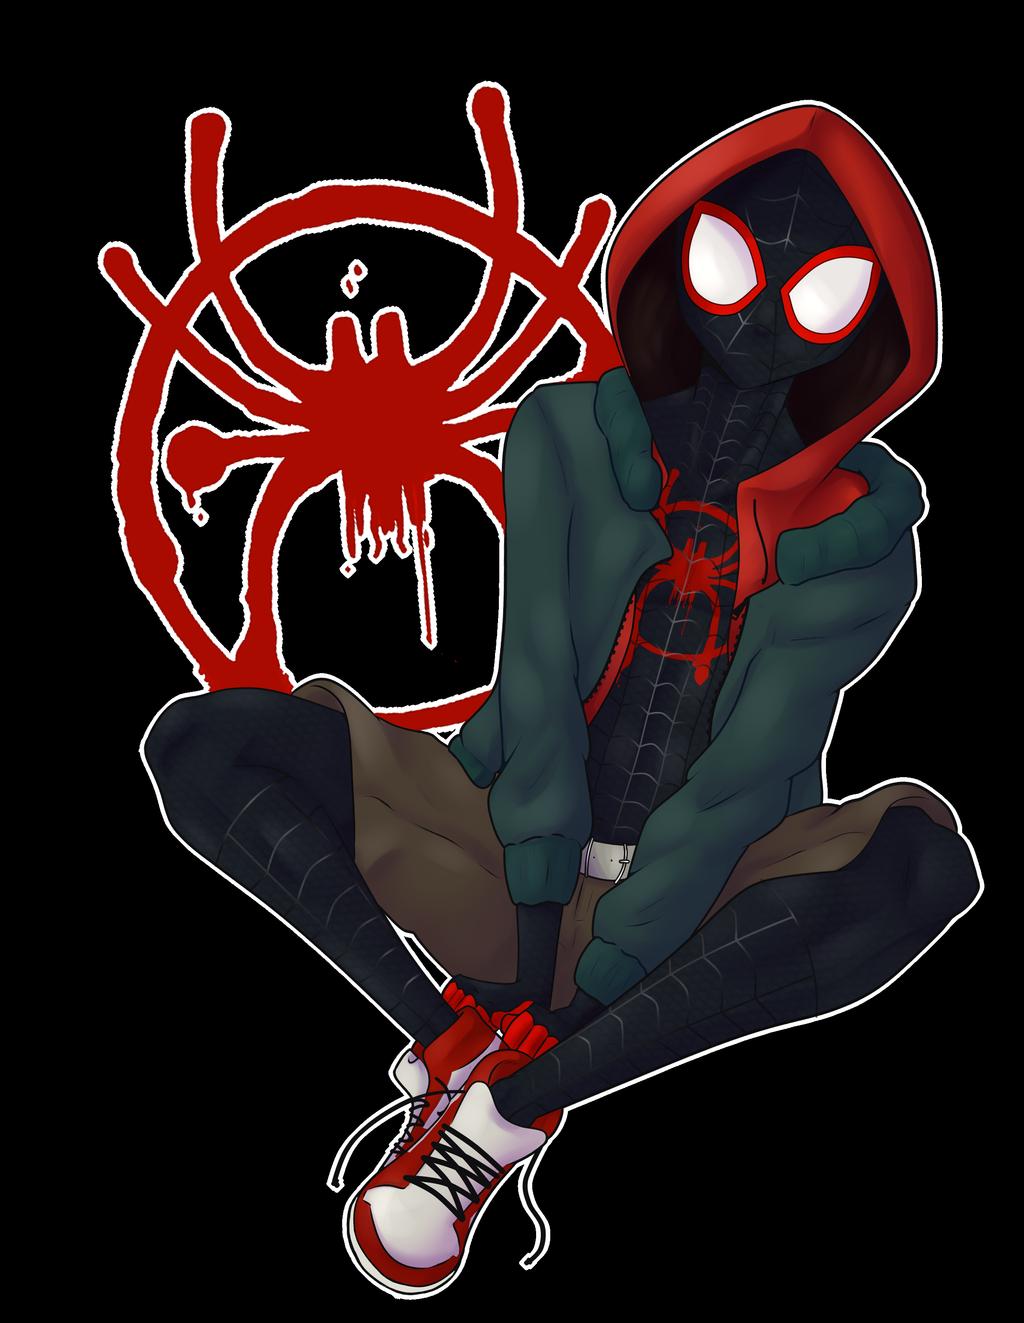 Miles Morales Fanart By Poppytsun On Deviantart Marvel Spiderman Art Spiderman Art Spiderman Artwork